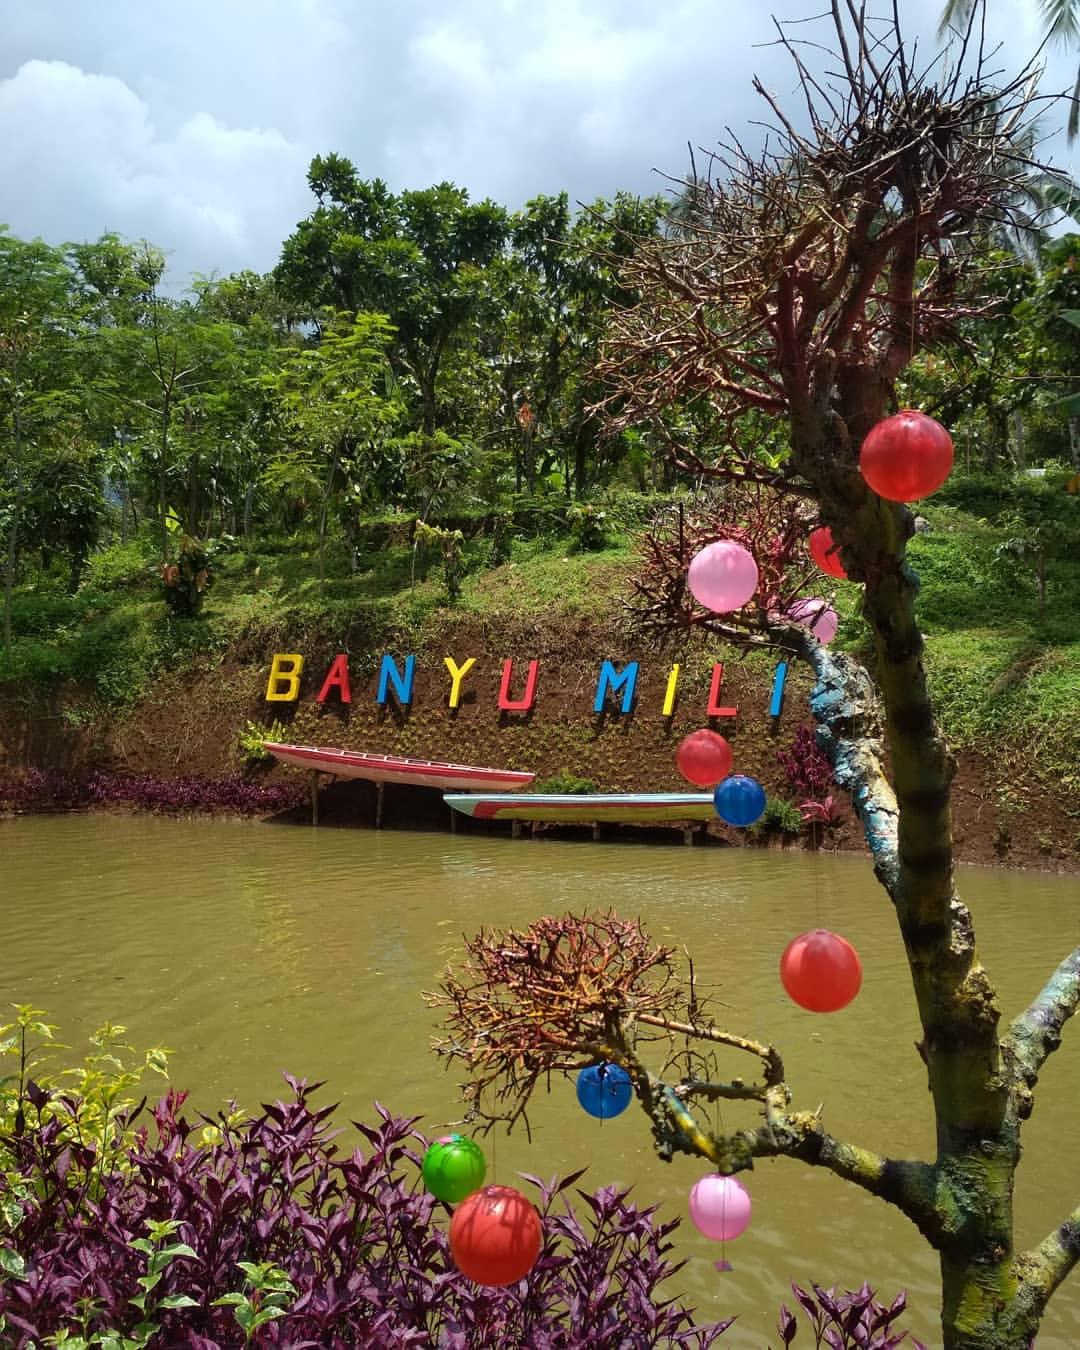 Wisata Banyu Mili Wonosalam Banyumiliwonosalam Instagram Profile Kamu Merasa Masalahmu